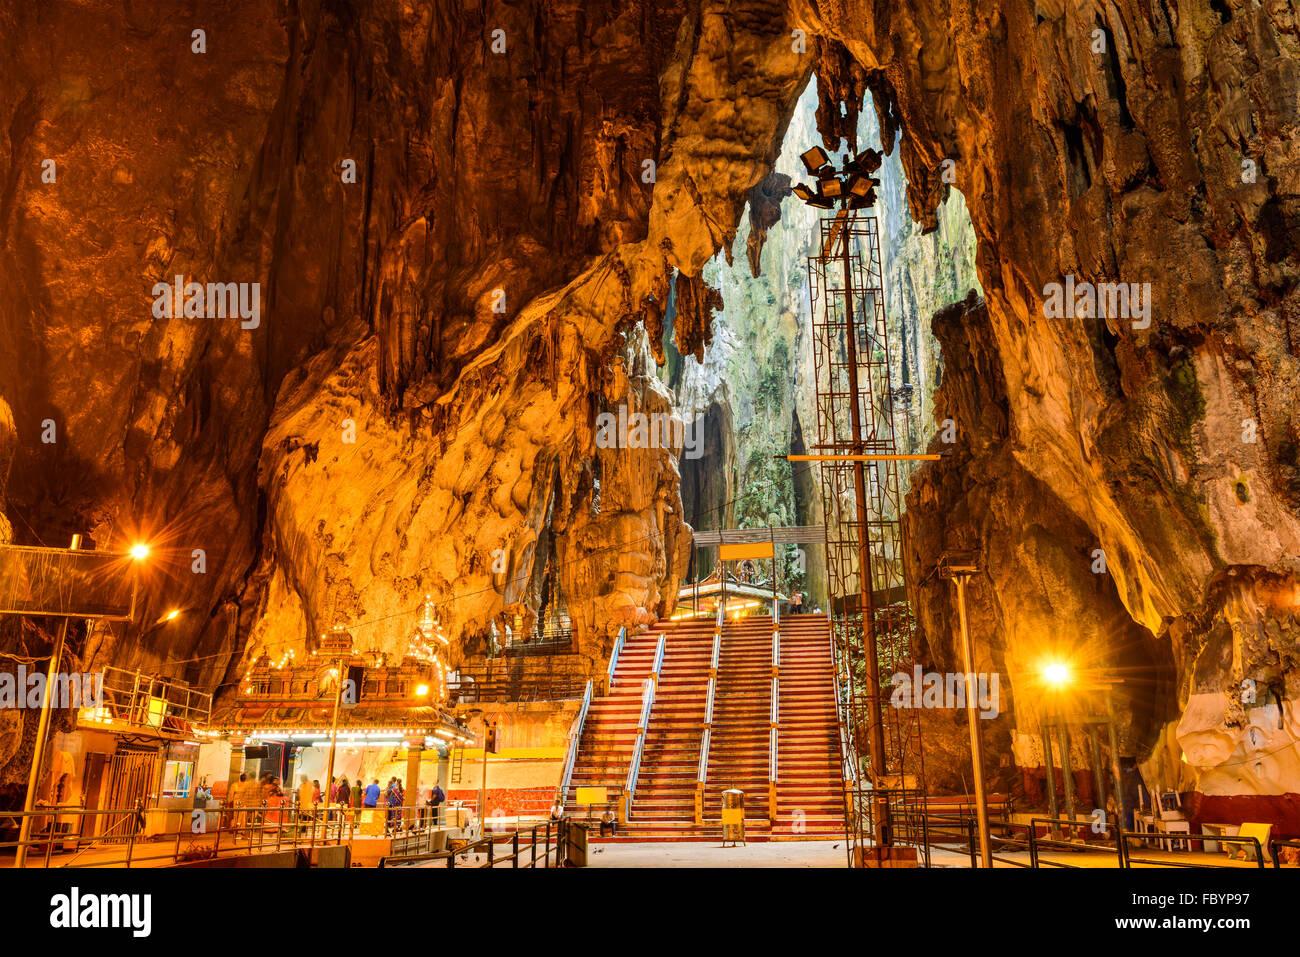 Batu Caves Hindu Shrine near Kuala Lumpur, Malaysia. - Stock Image